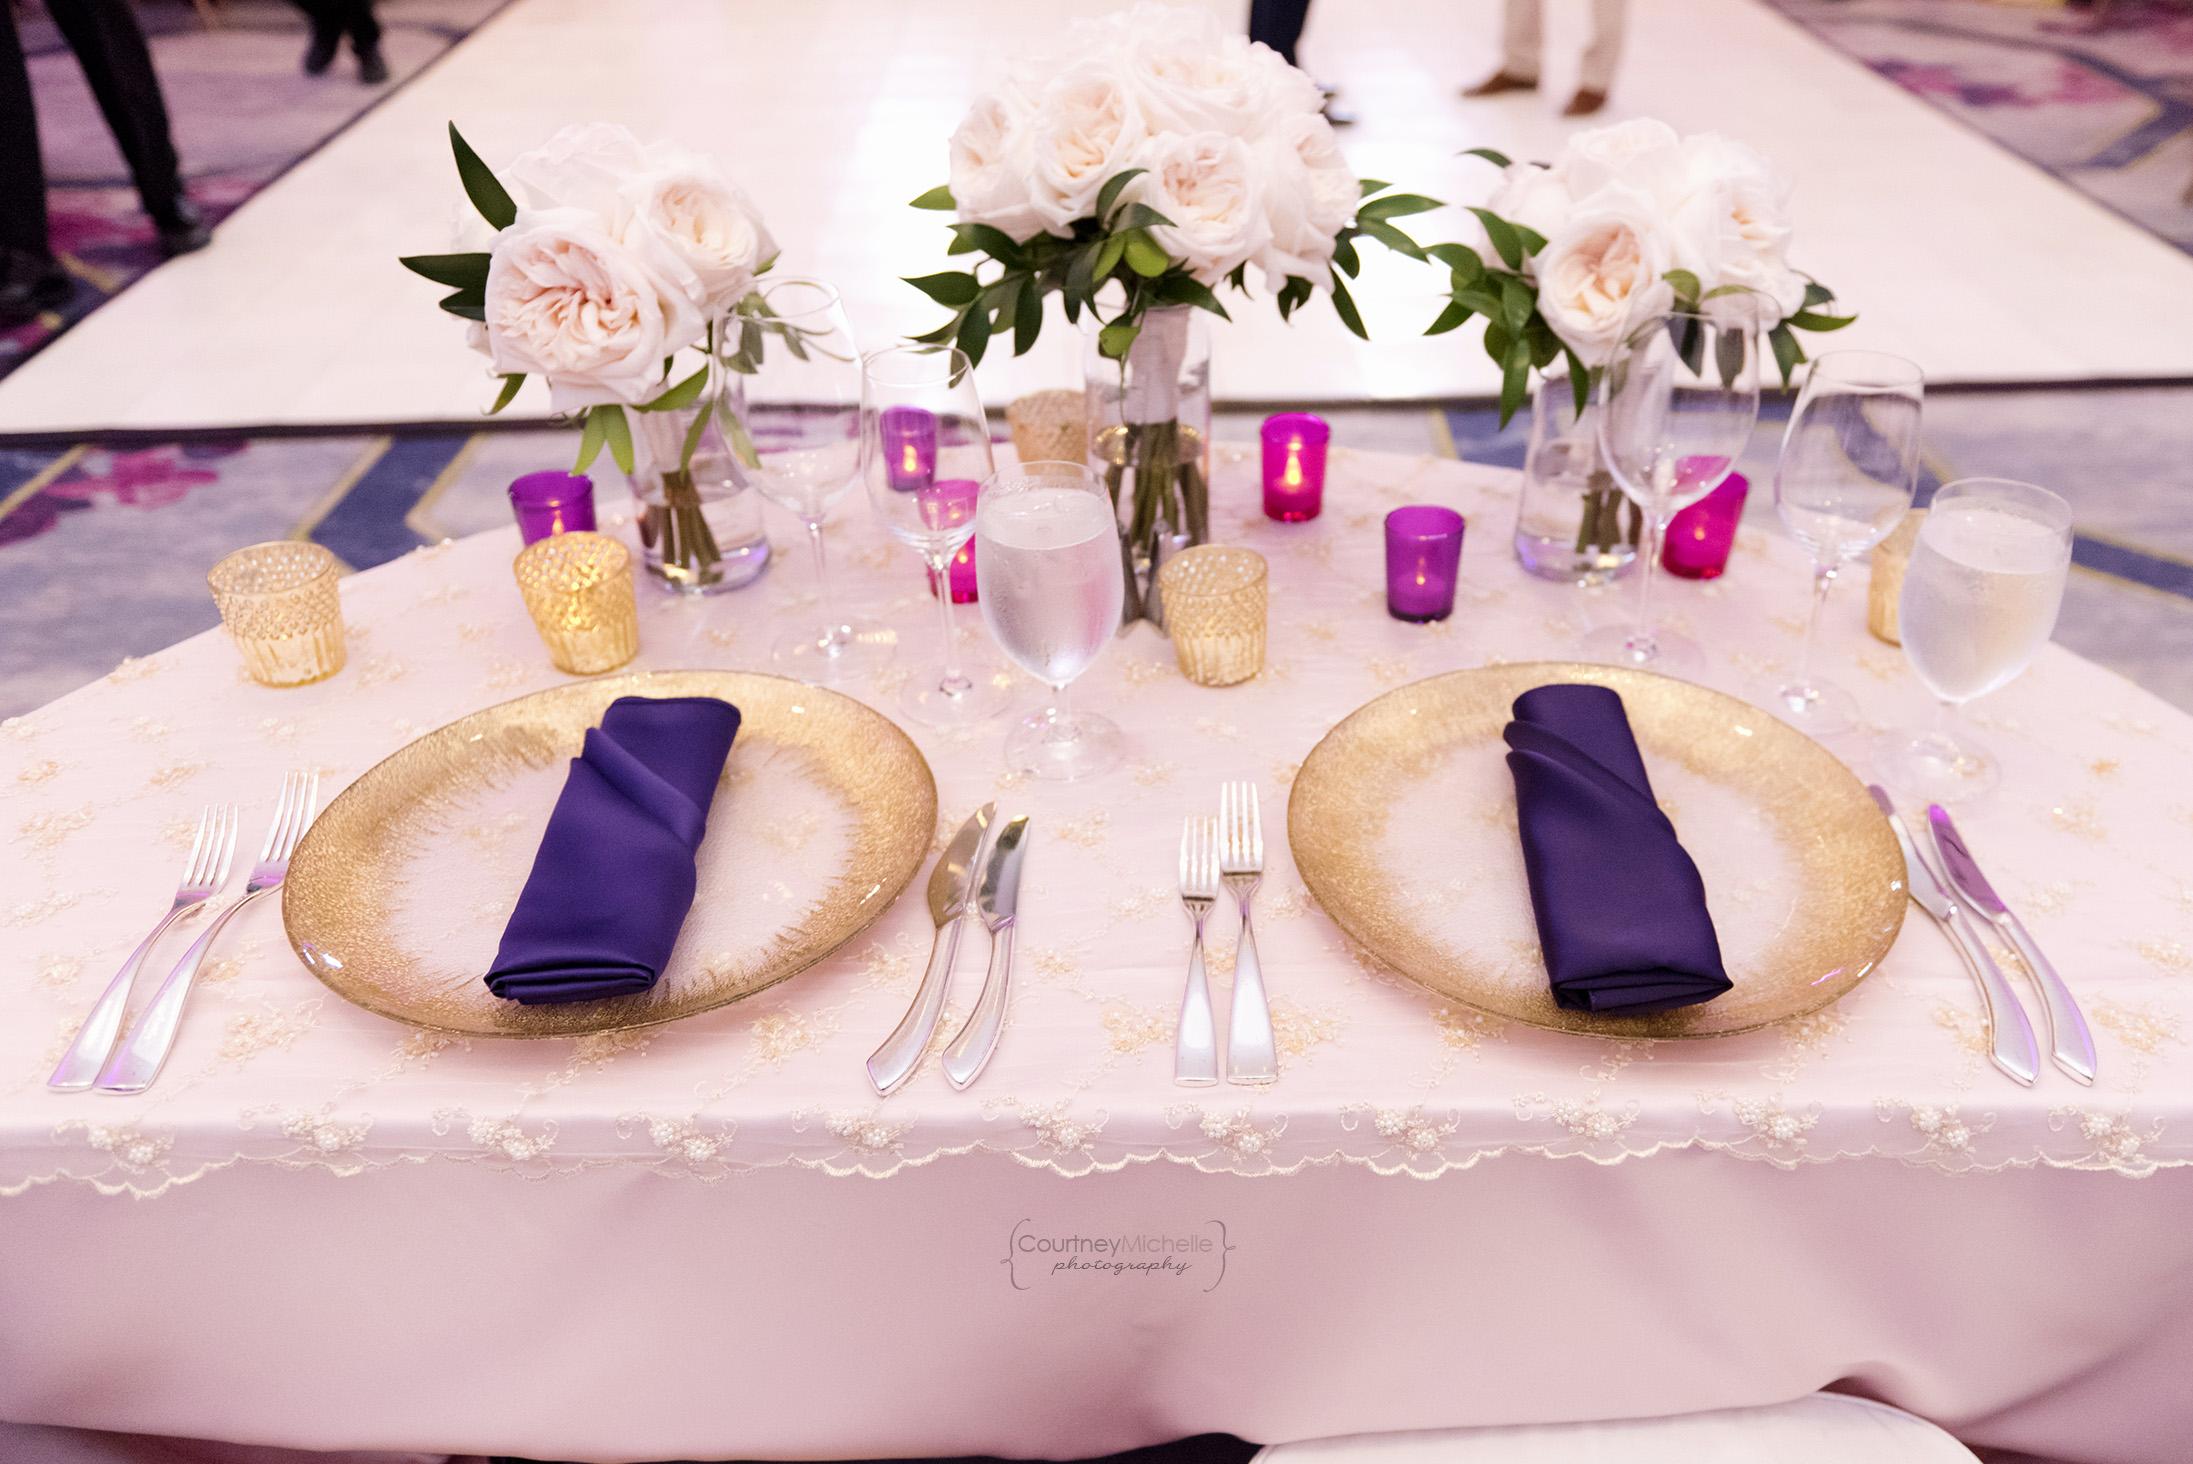 sweetheart-table-wedding-reception-grand-cayman-beach-wedding-photography-by-courtney-laper©CopyrightCMP-LeaAnneRaj-8065.jpg